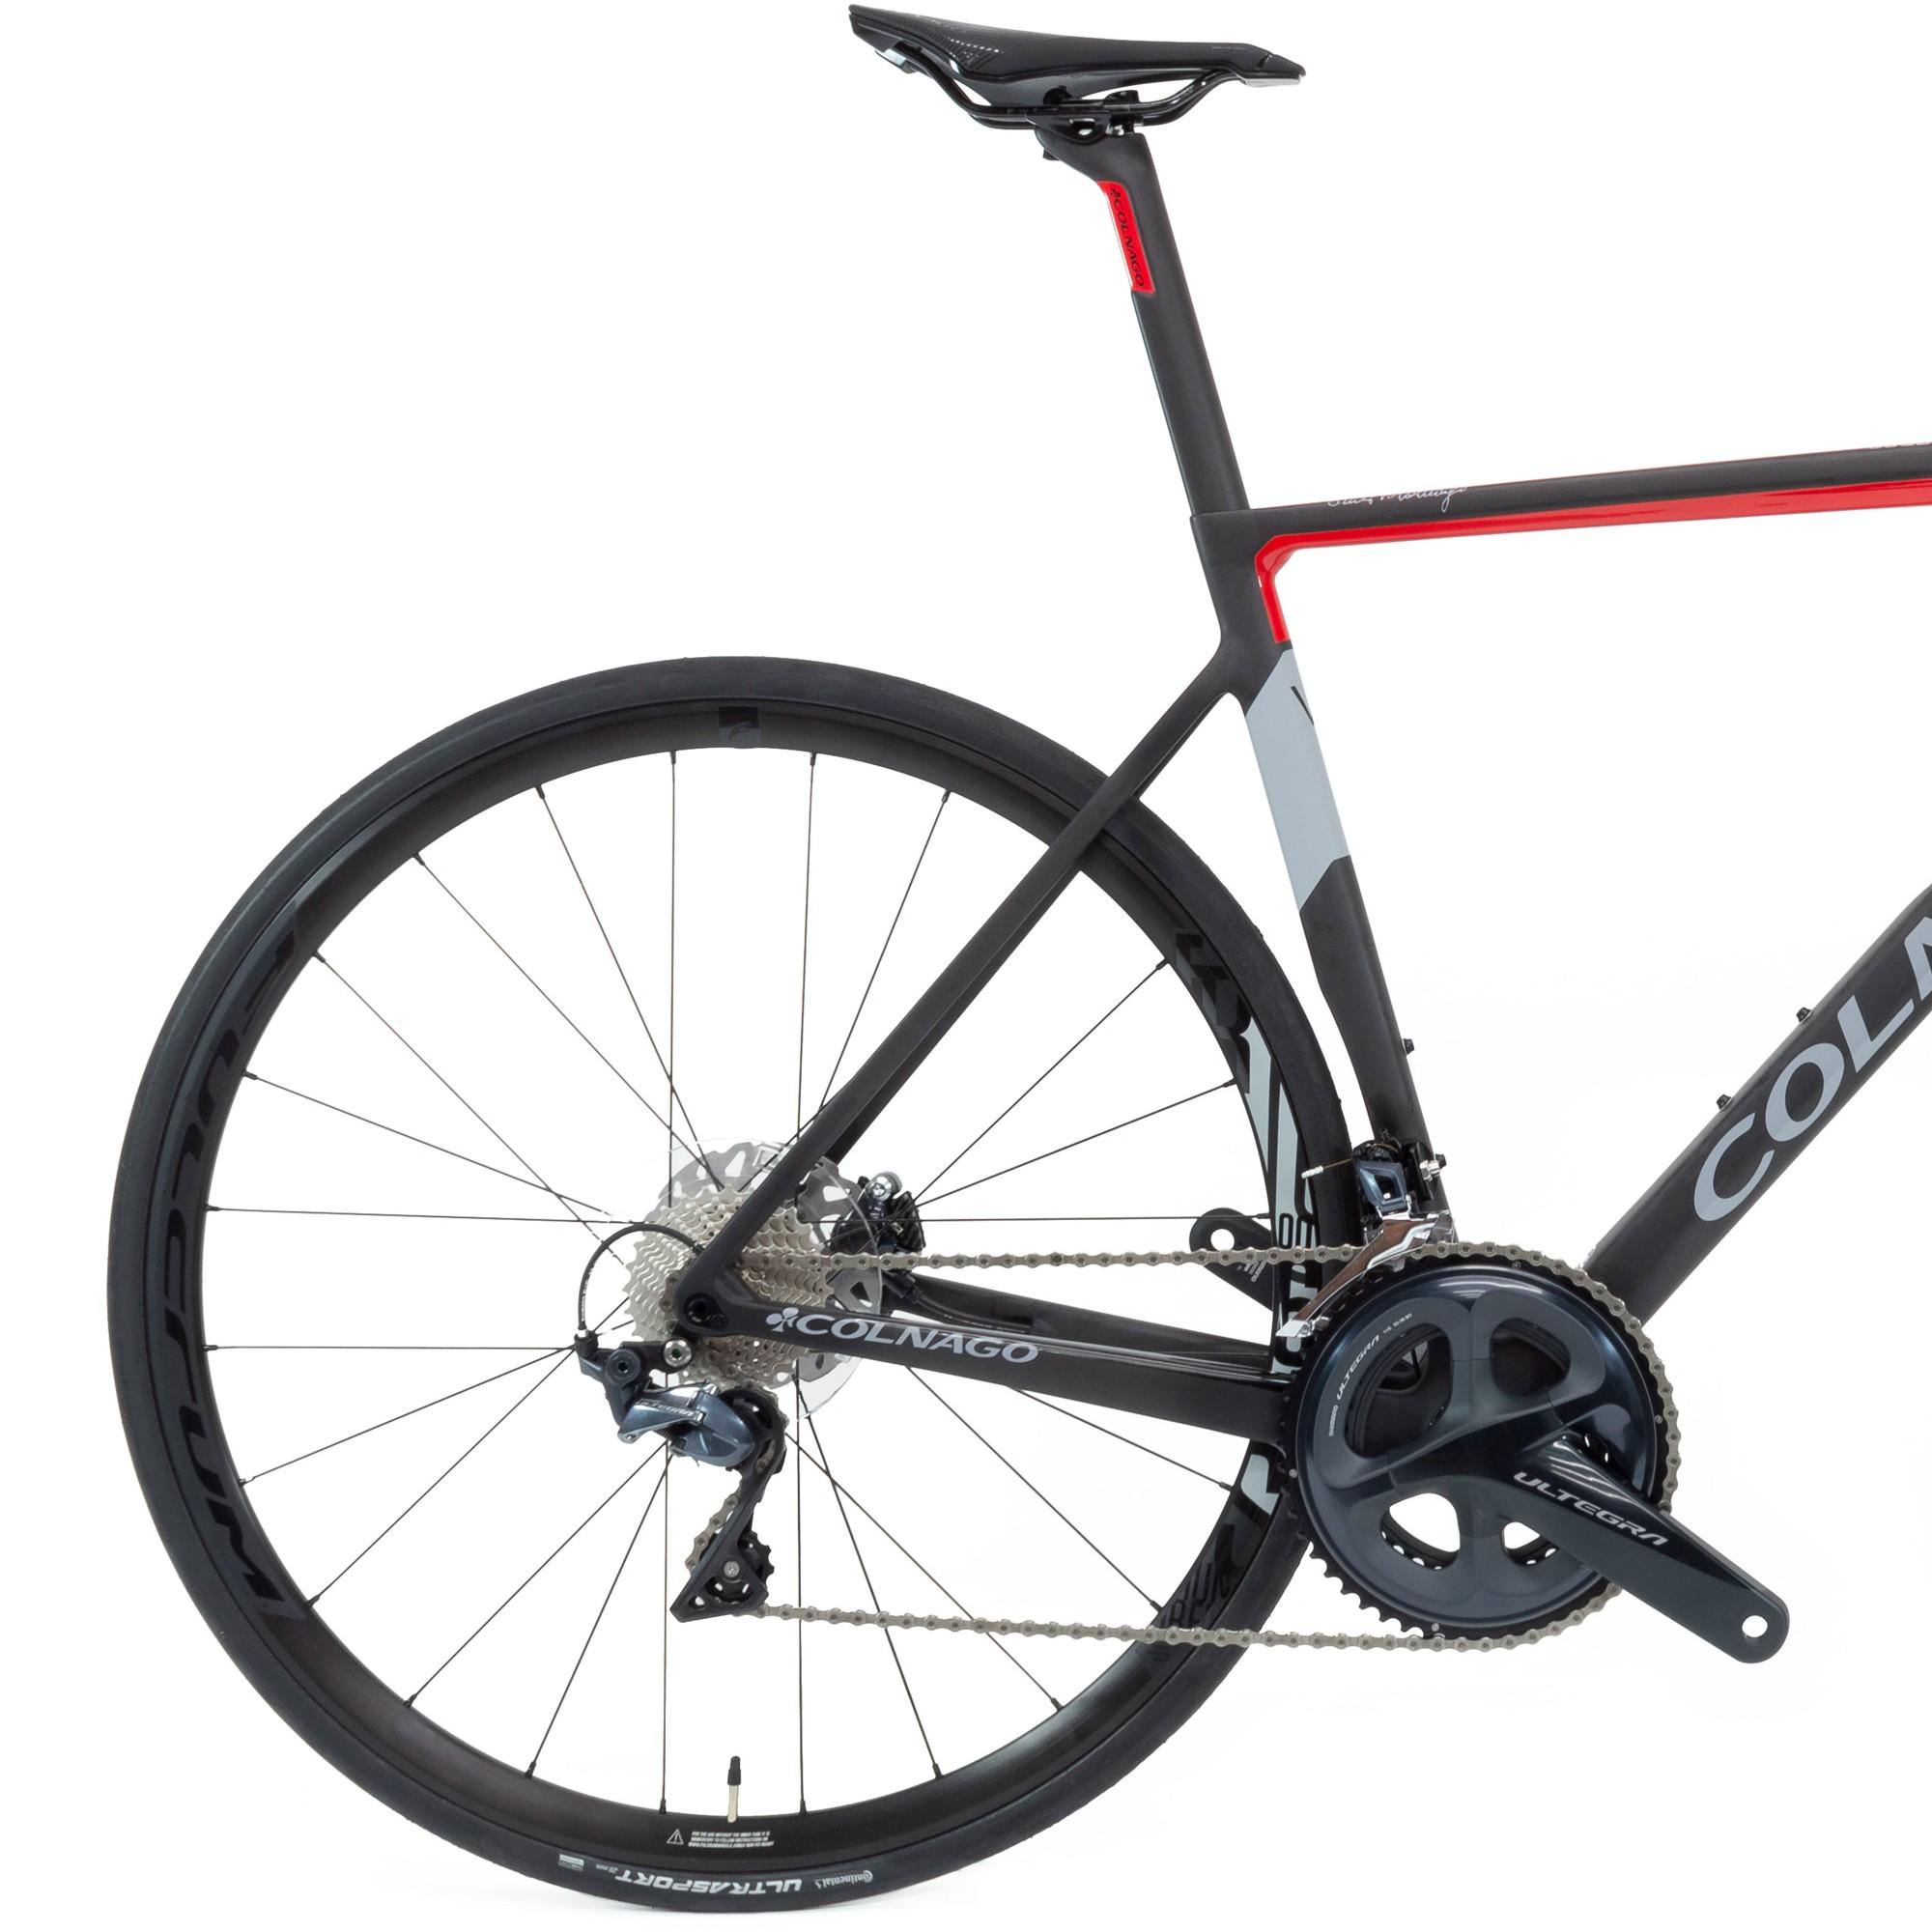 Colnago-V3-Disc-Ultegra-Road-Bike-2020 - 1